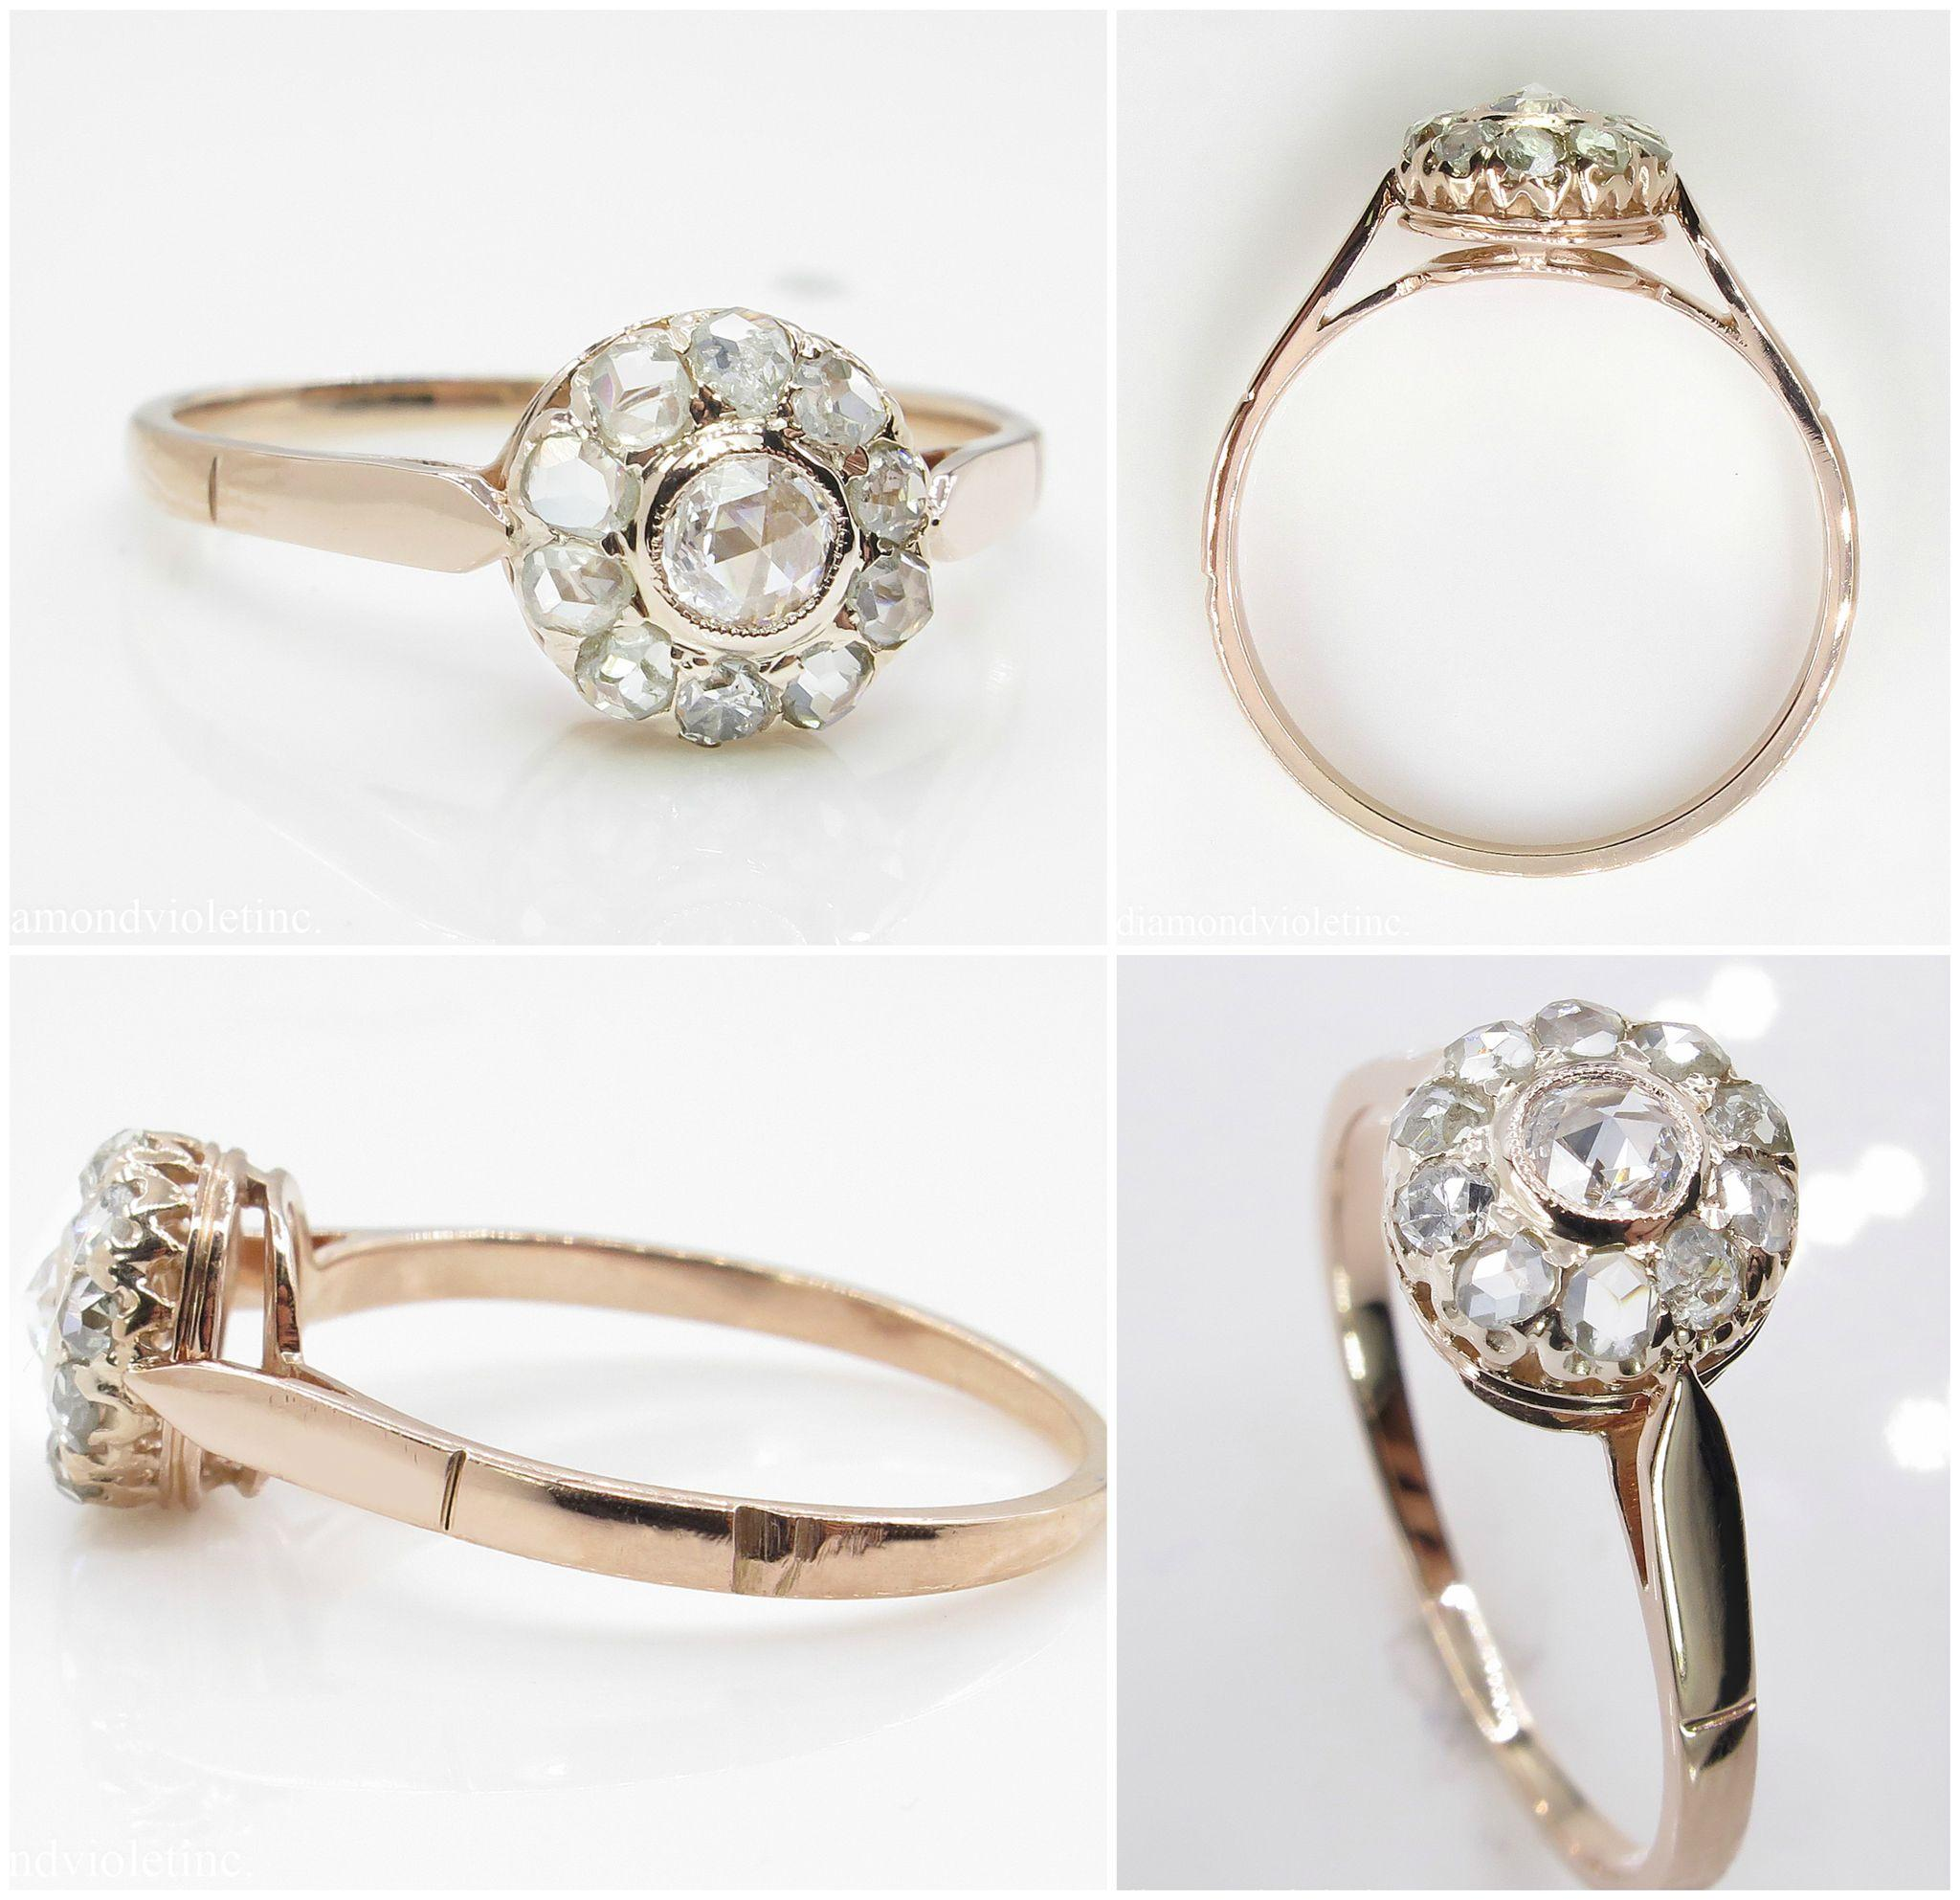 Antique Rose cut Diamond Cluster Engagement 18k Rose Gold Ring